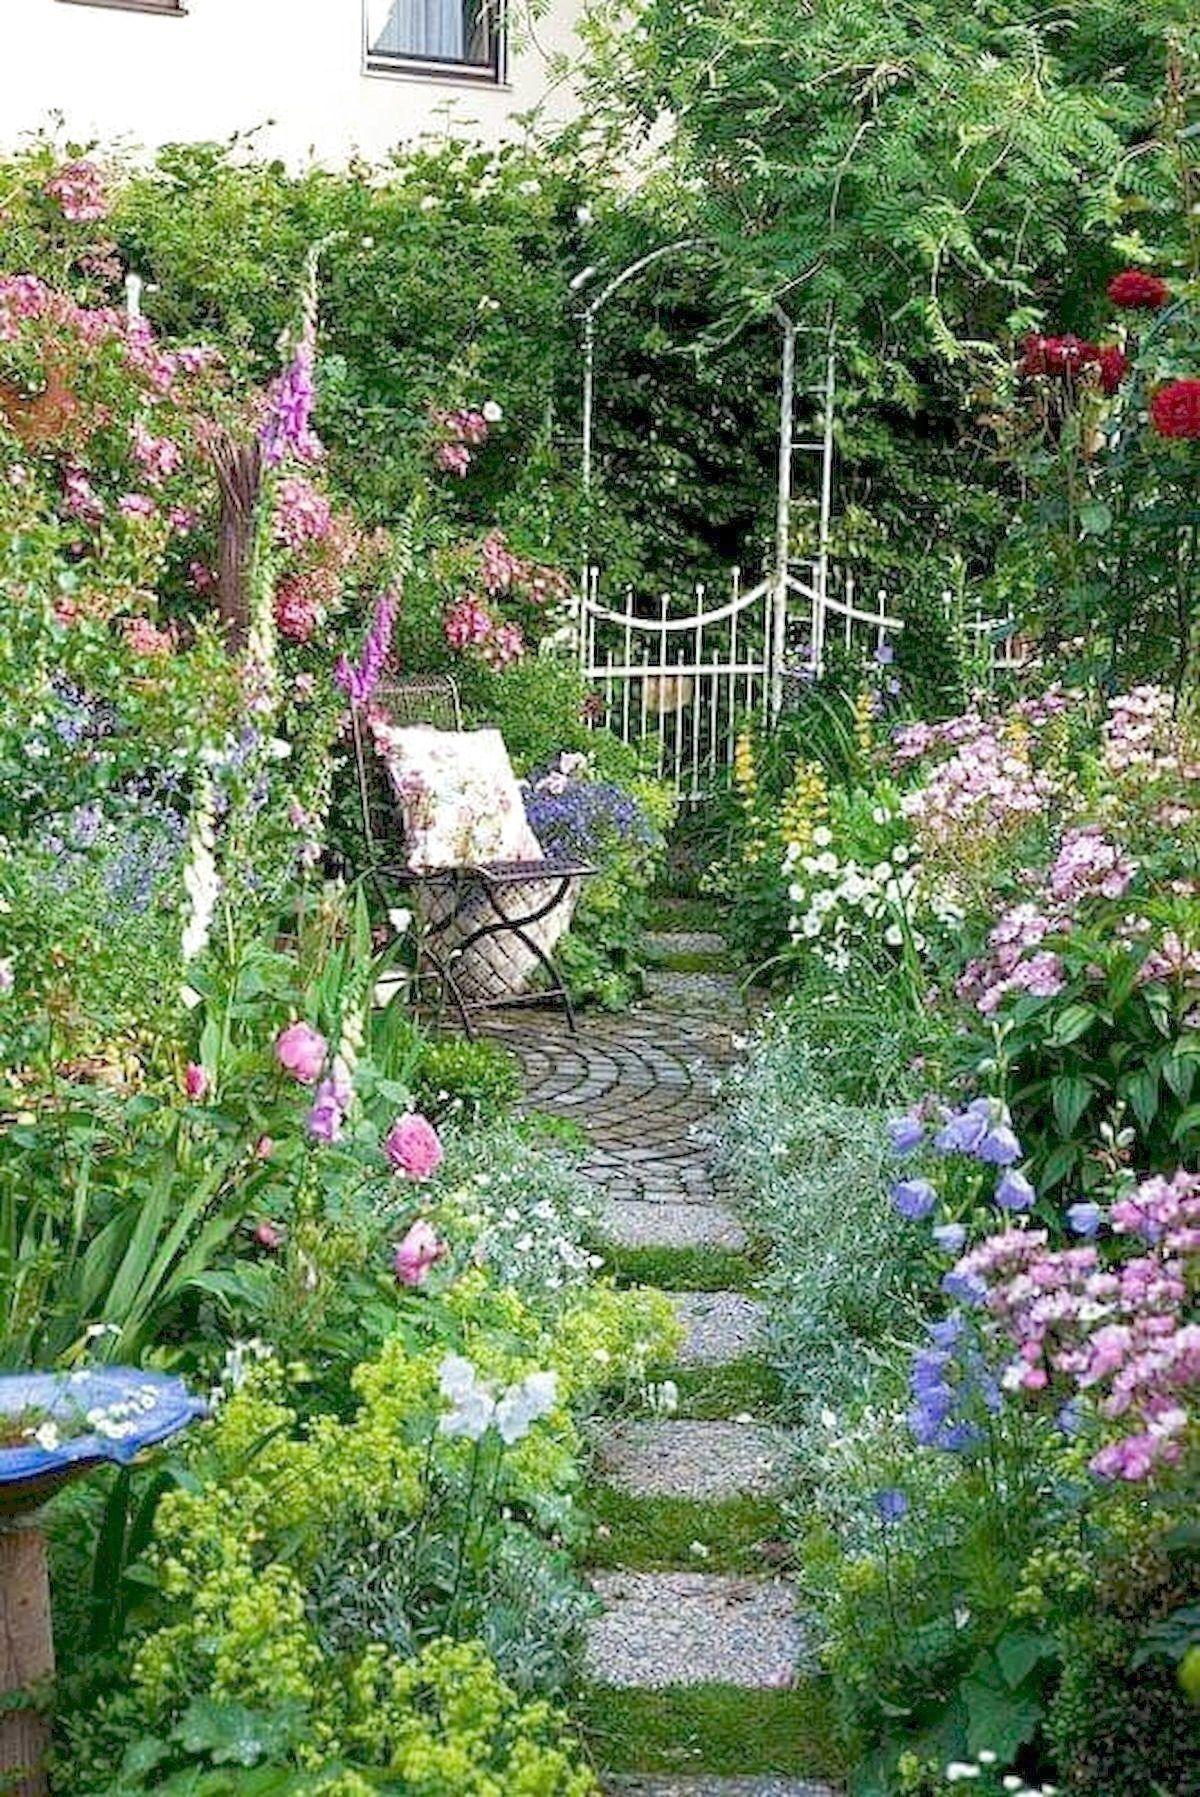 Small Garden Design Ideas Low Maintenance Frugal Living Small Cottage Garden Ideas Small Garden Design Ideas Low Maintenance Small Garden Design,Black Home Interior Designers